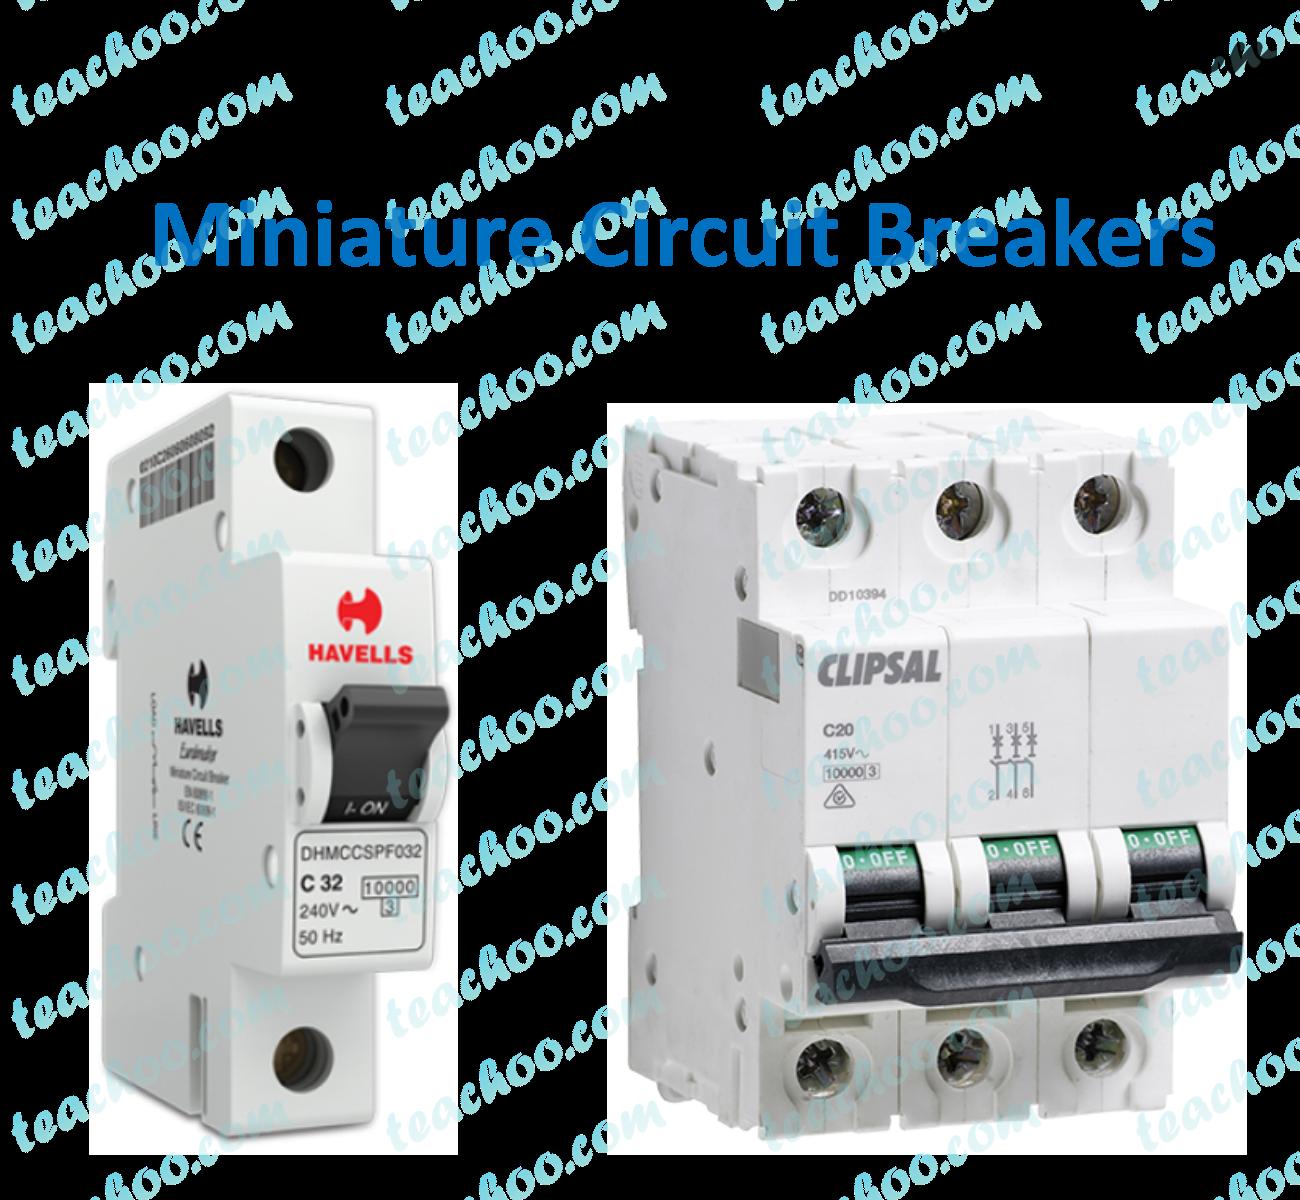 miniature-circuit-breakers-(mcb)---teachoo.png